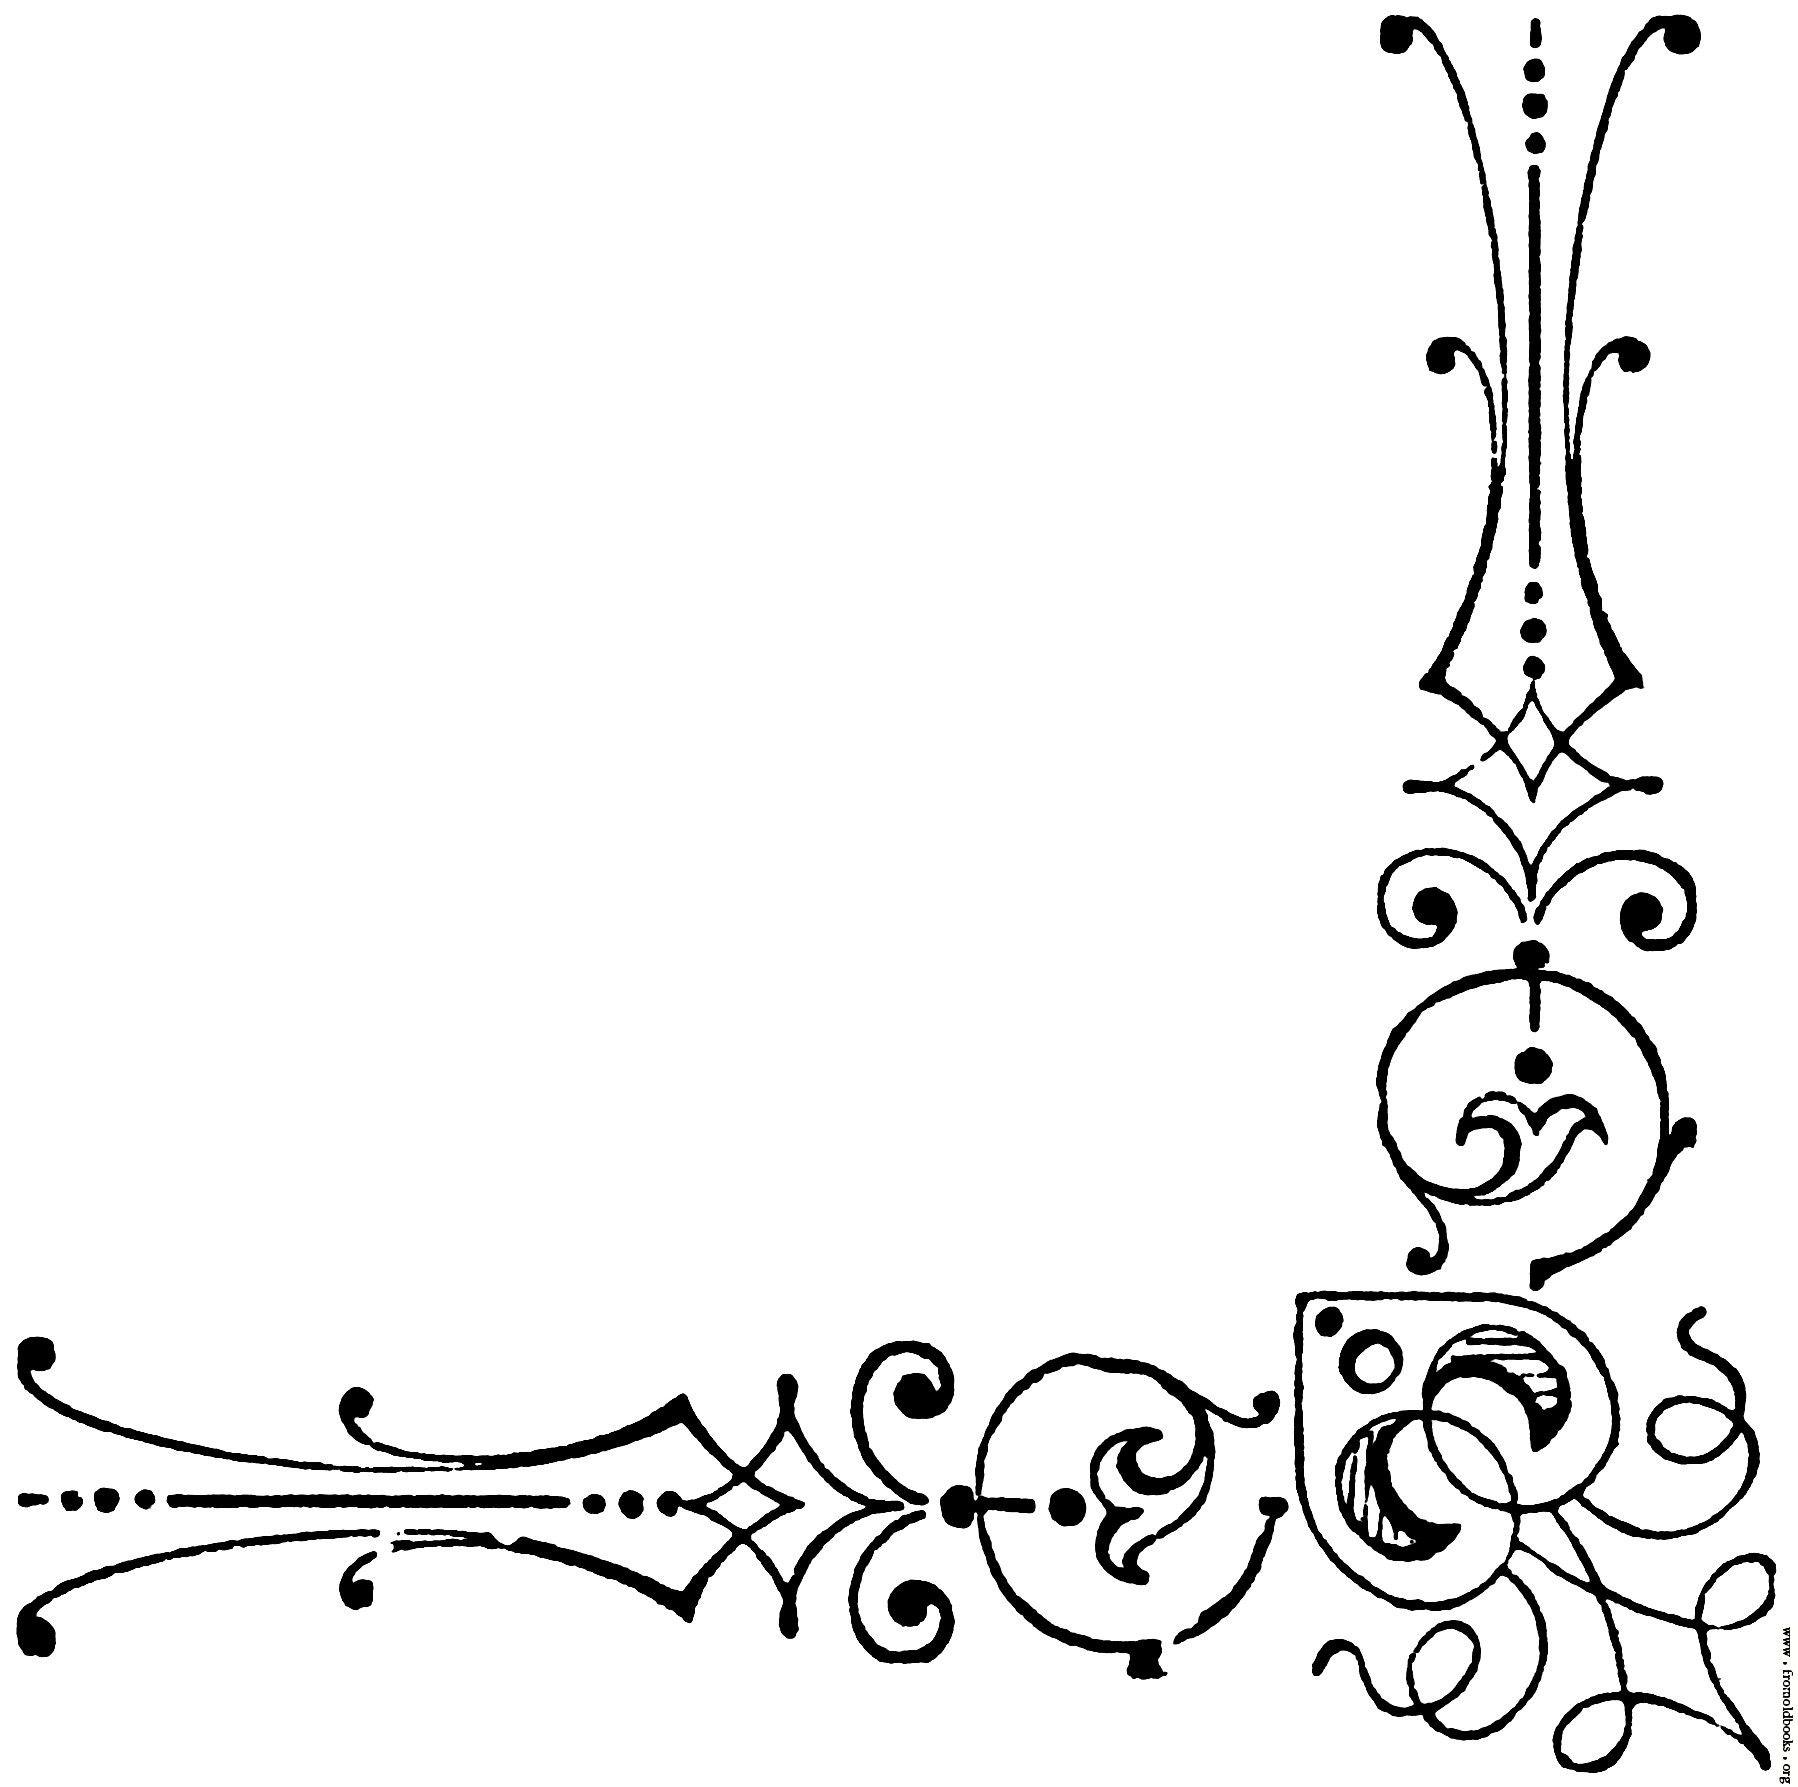 Celtic-vine-corner Clip Art at Clker.com - vector clip art online, royalty  free & public domain